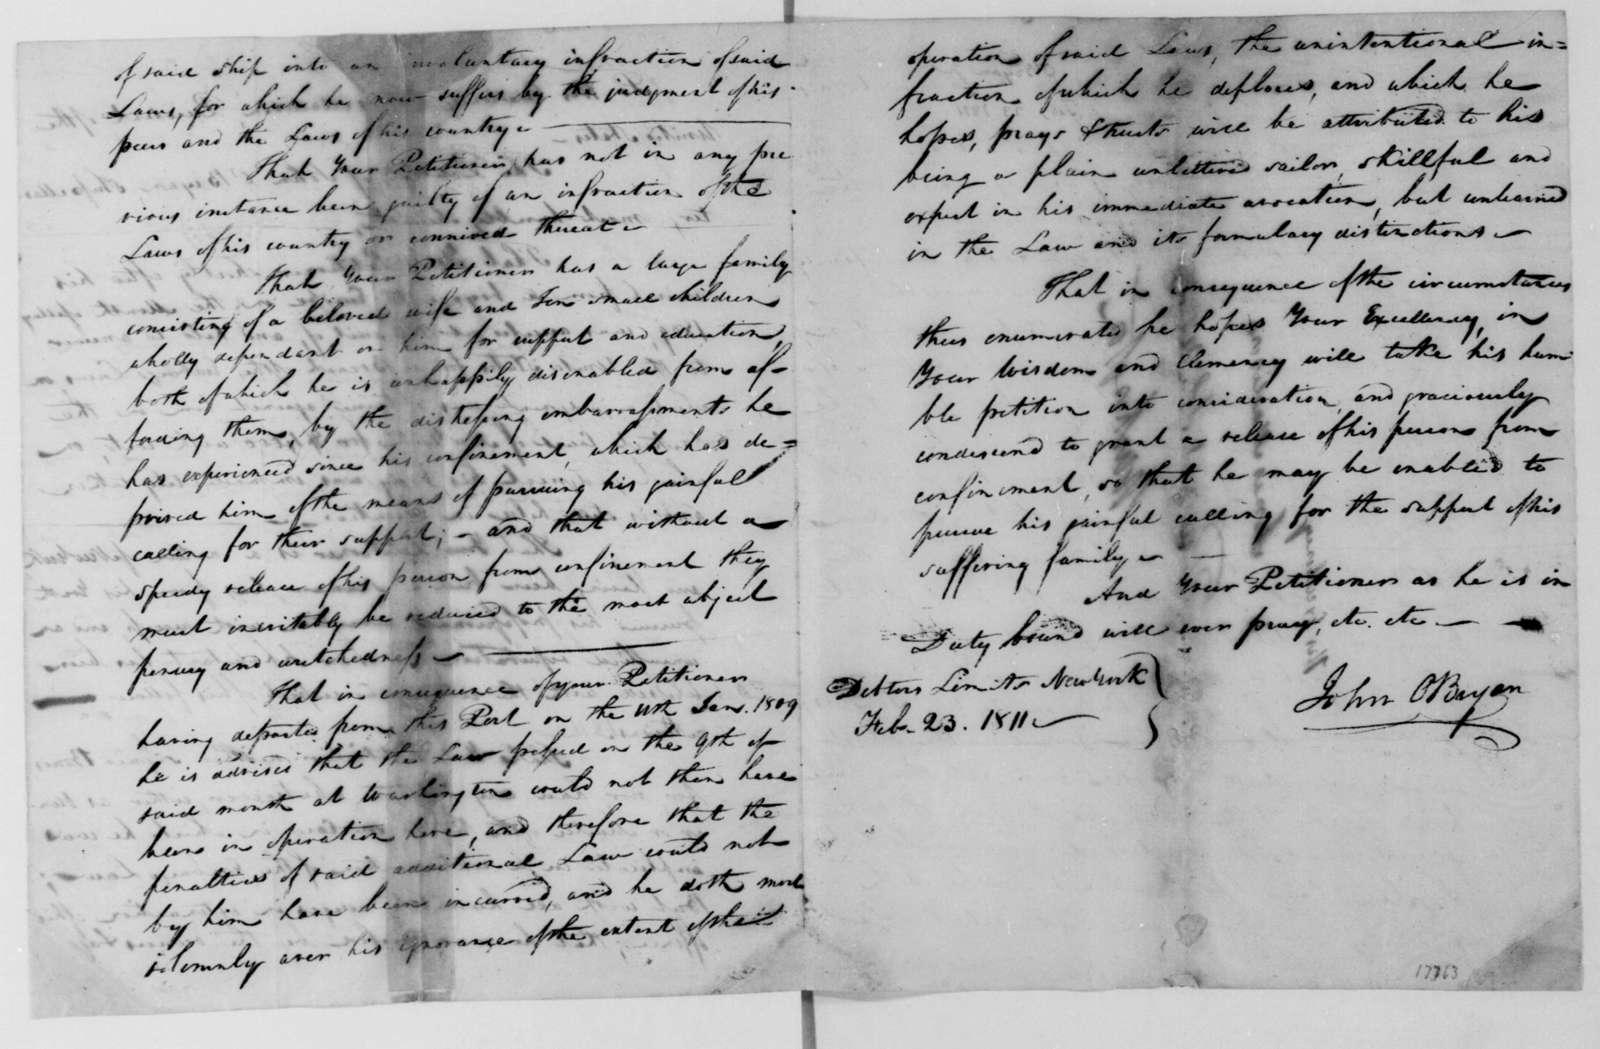 John O'Bryan to James Madison, February 23, 1811. Petition.